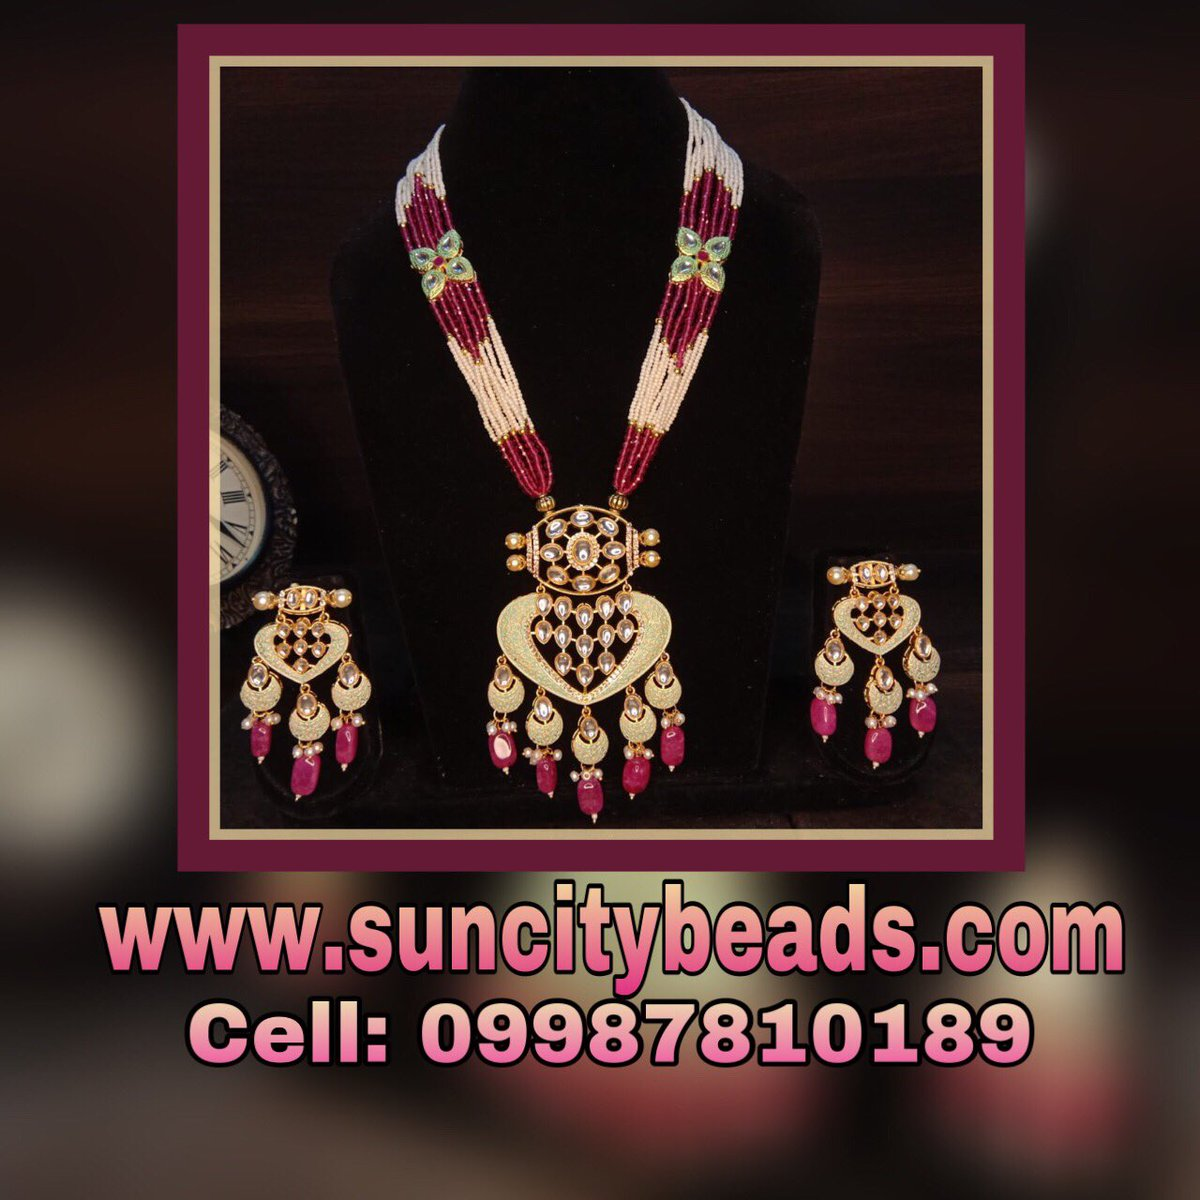 pendant necklace book order @ 9987810189 Whatsapp  #jadaujewellery #kundannecklace #beadsjewellery #suncitybeads #jewellerydesign #jewelrymaking #jewelrydesigner  #WeddingGifts #weddingjewellery #jewelrylove #zevarking #jewellerymaking #maketoorderjewellery #exhibitionjewellerypic.twitter.com/Mz25mTYAF7